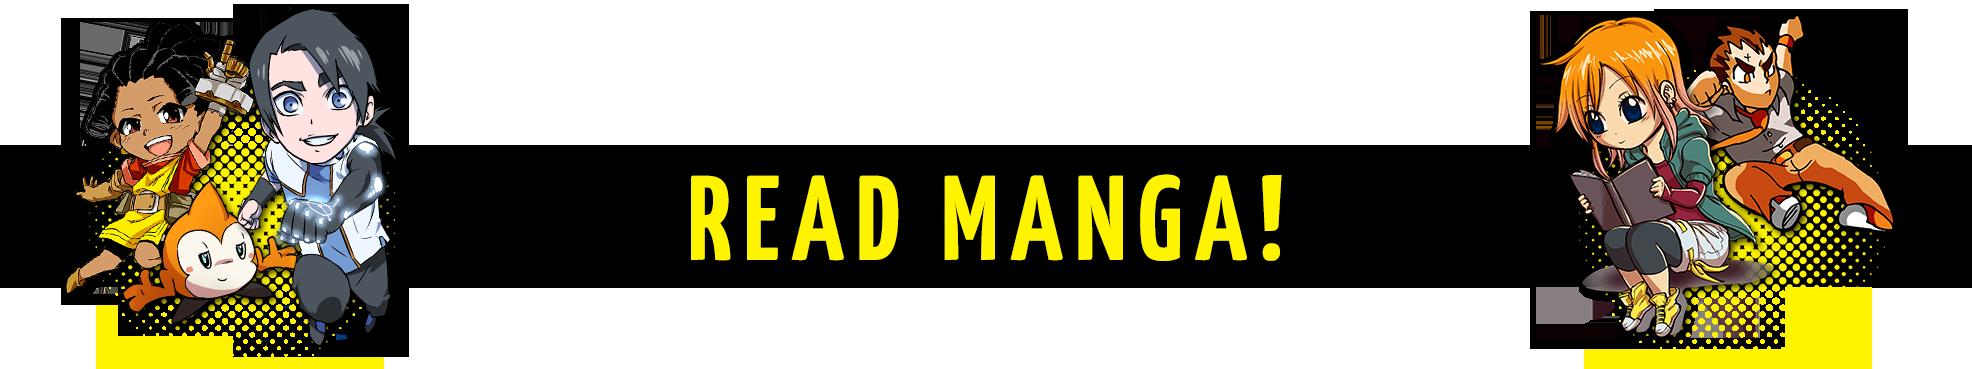 banner READ MANGA.png